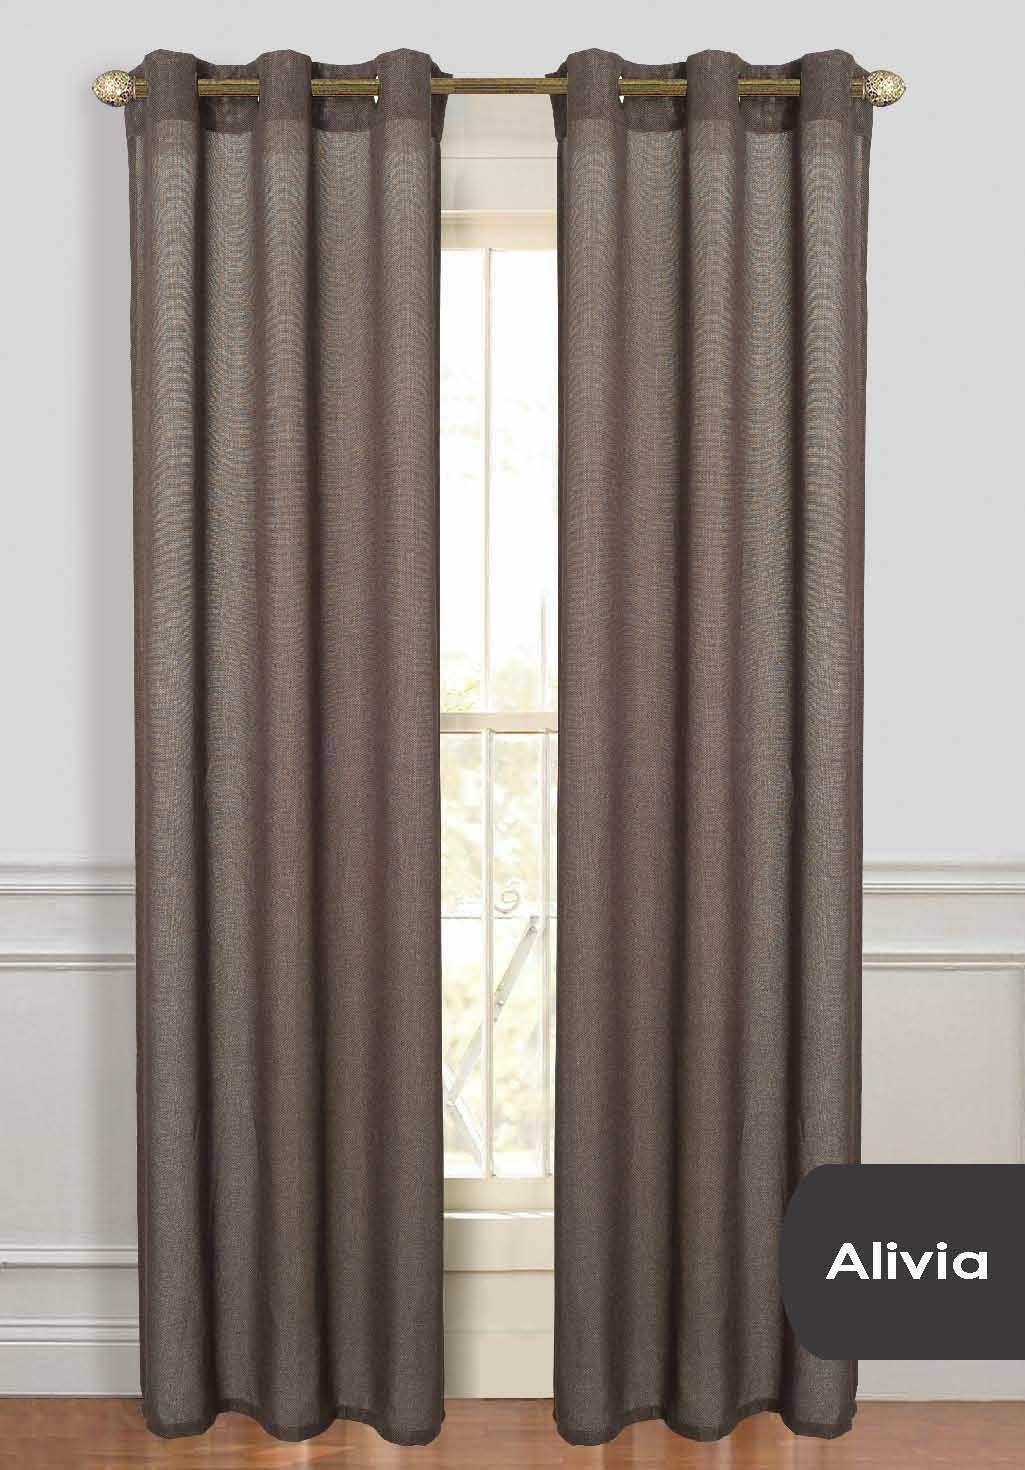 Alivia Curtain Panel